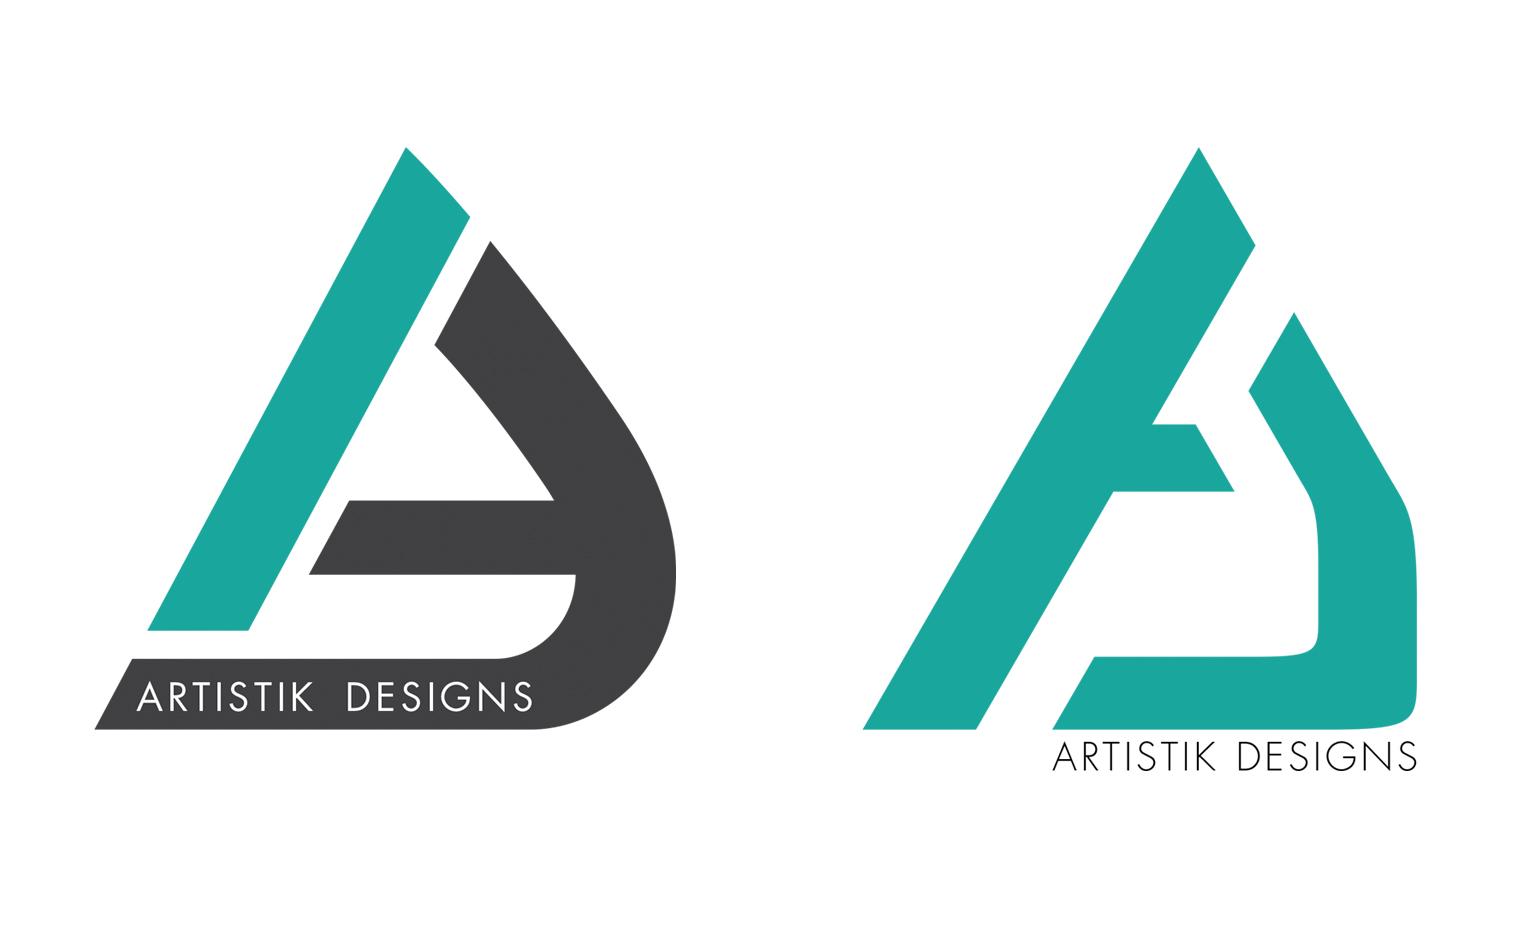 Finalizing the logo design.